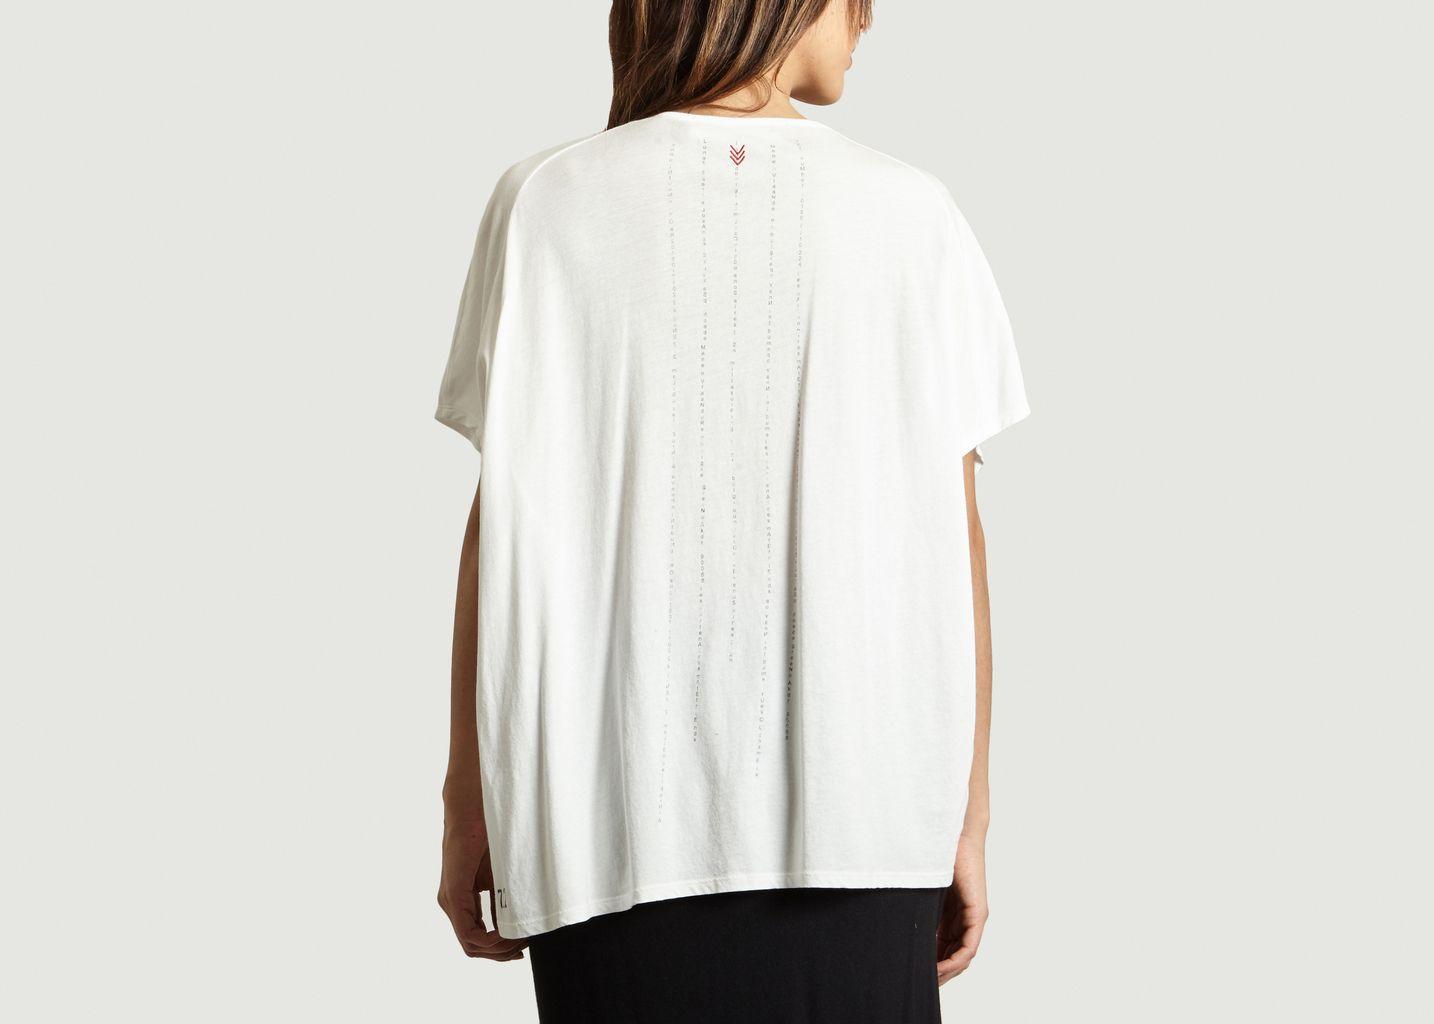 T-Shirt Klara  - June 7.2